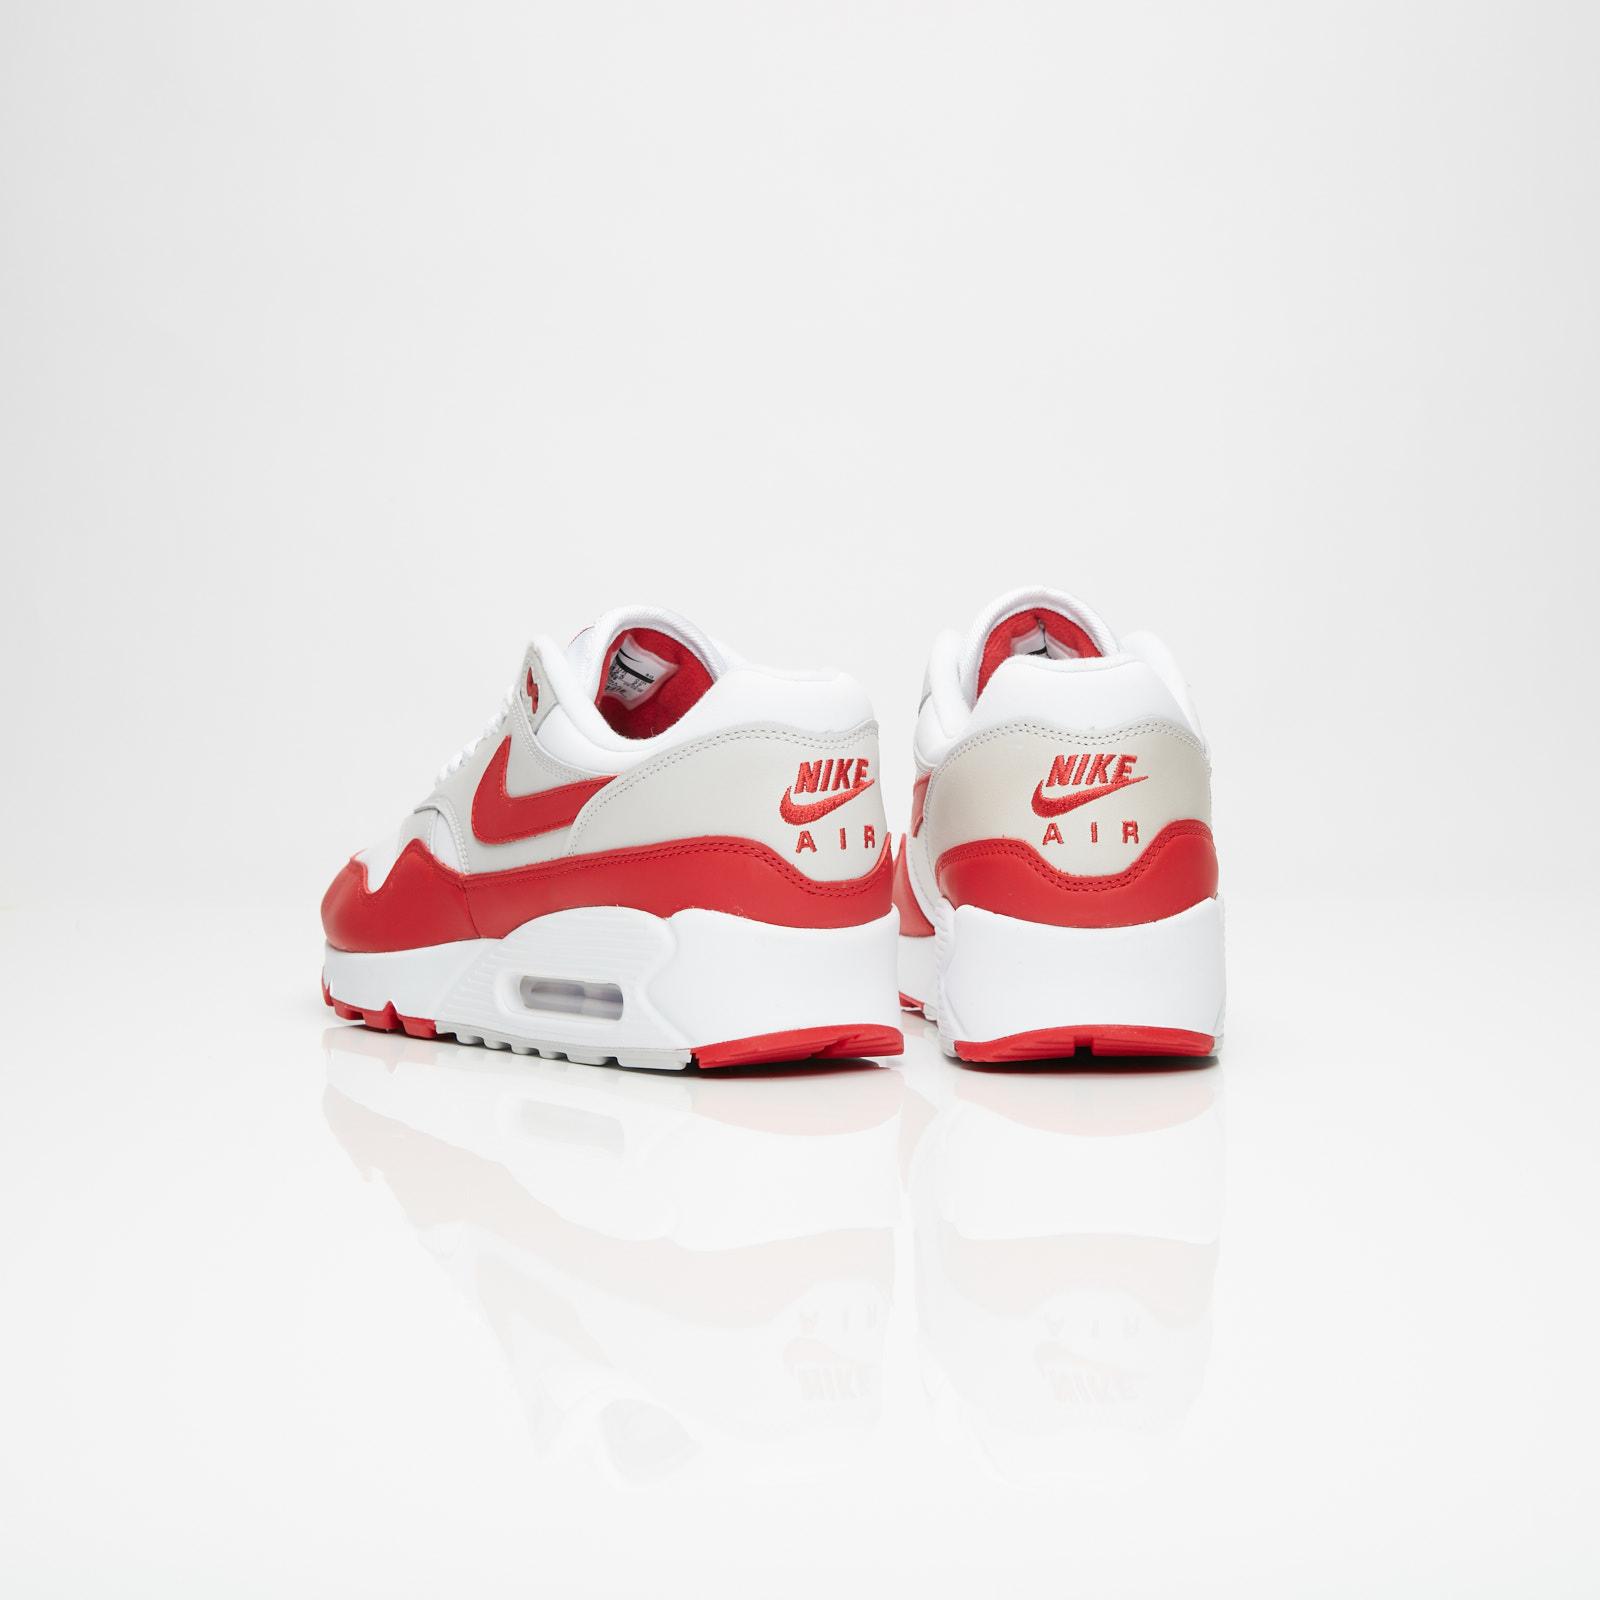 1b2f92533f613 Nike Air Max 90/1 - Aj7695-100 - Sneakersnstuff | sneakers & streetwear  online since 1999